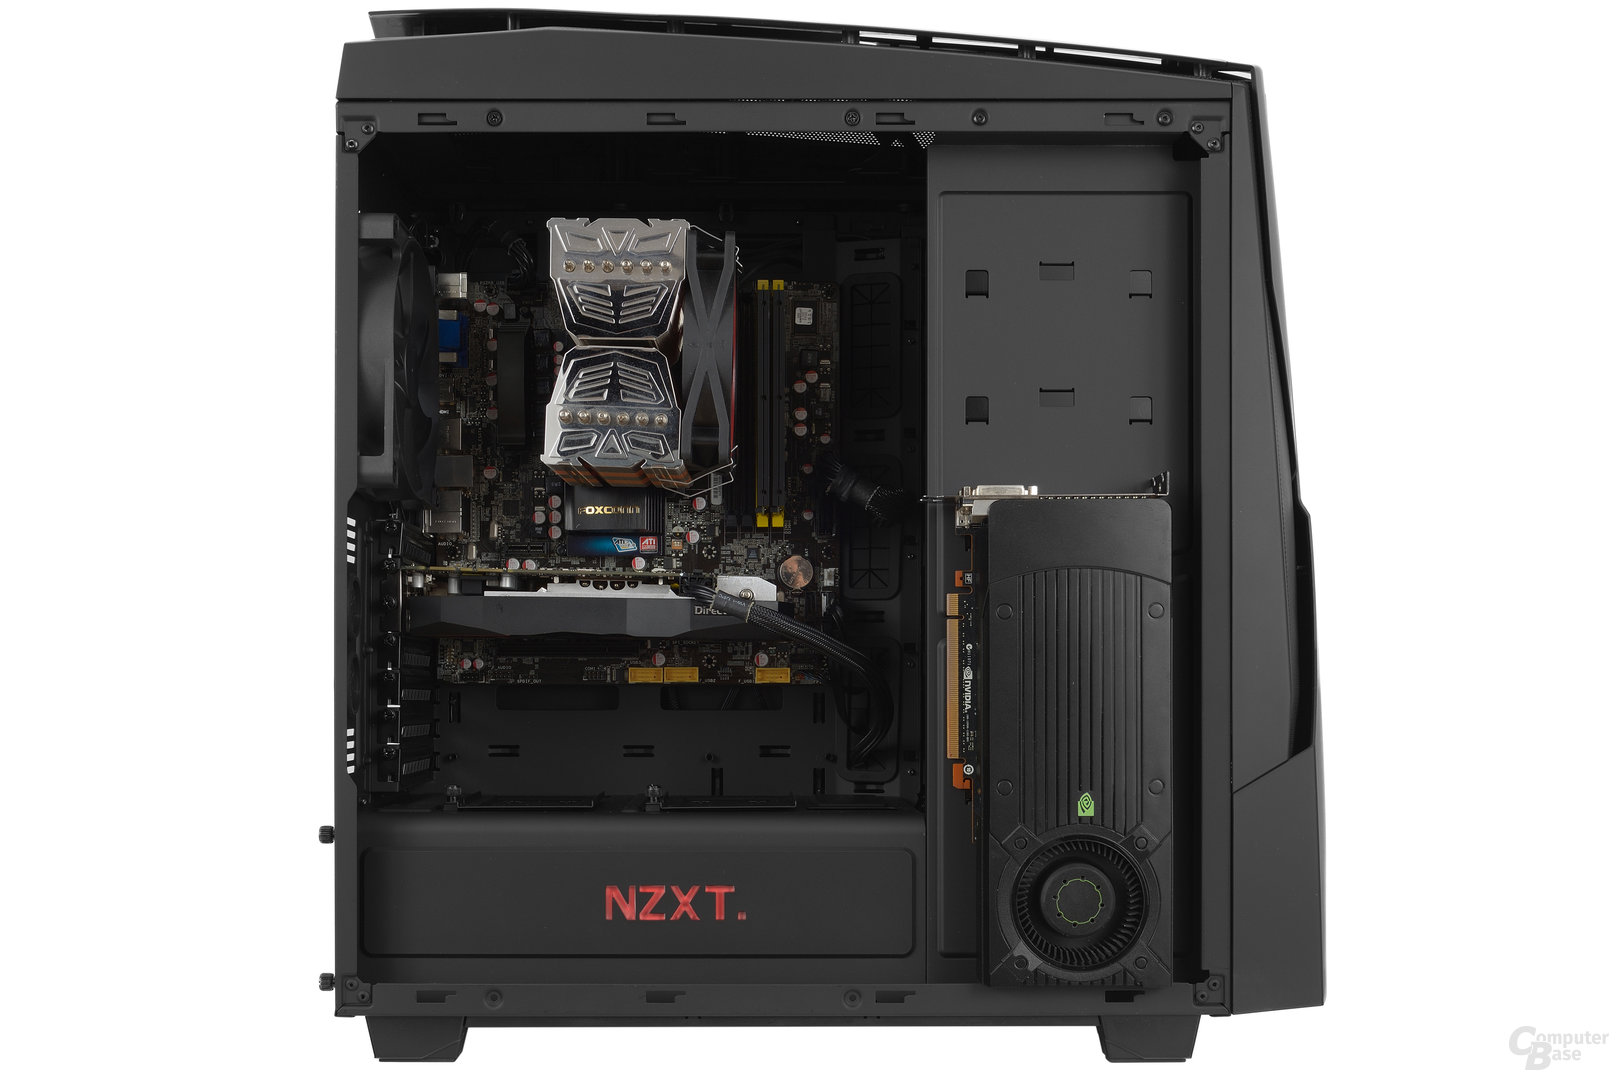 NZXT Noctis 450 – Testsystem